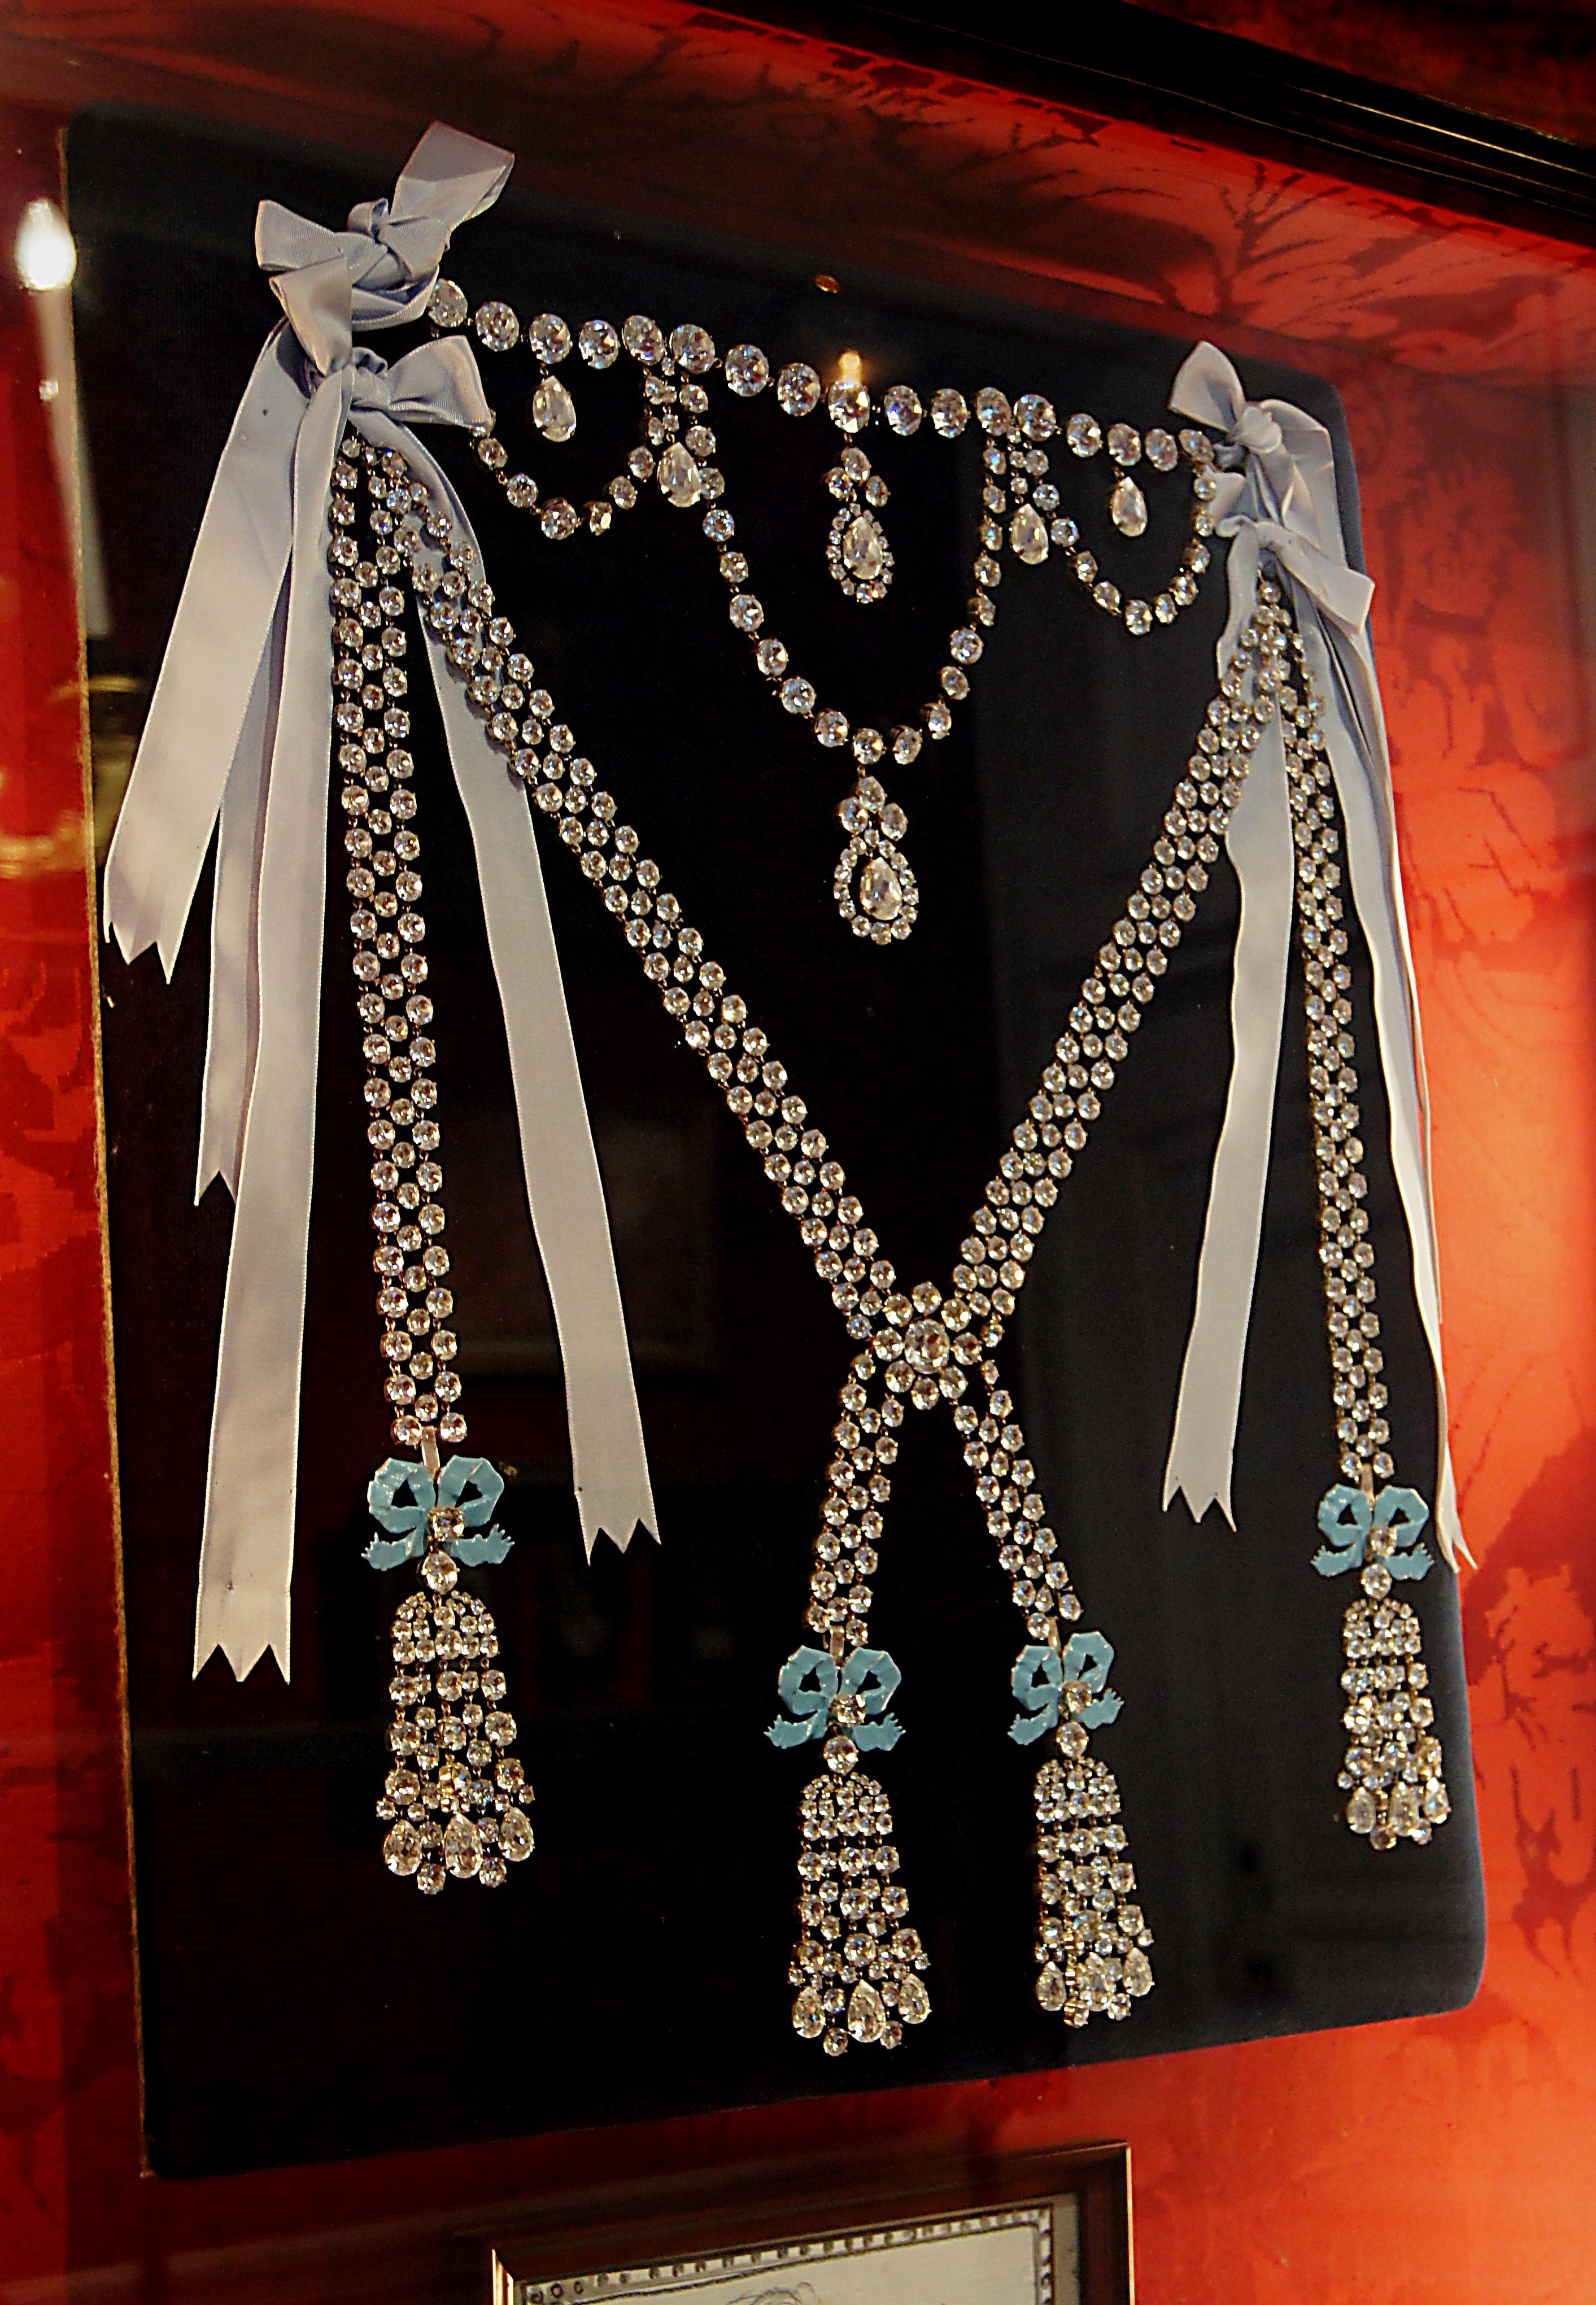 Kopie des berühmt-berüchtigten Colliers in Schloss Breteuil, Frankreich | Foto via Wikipedia